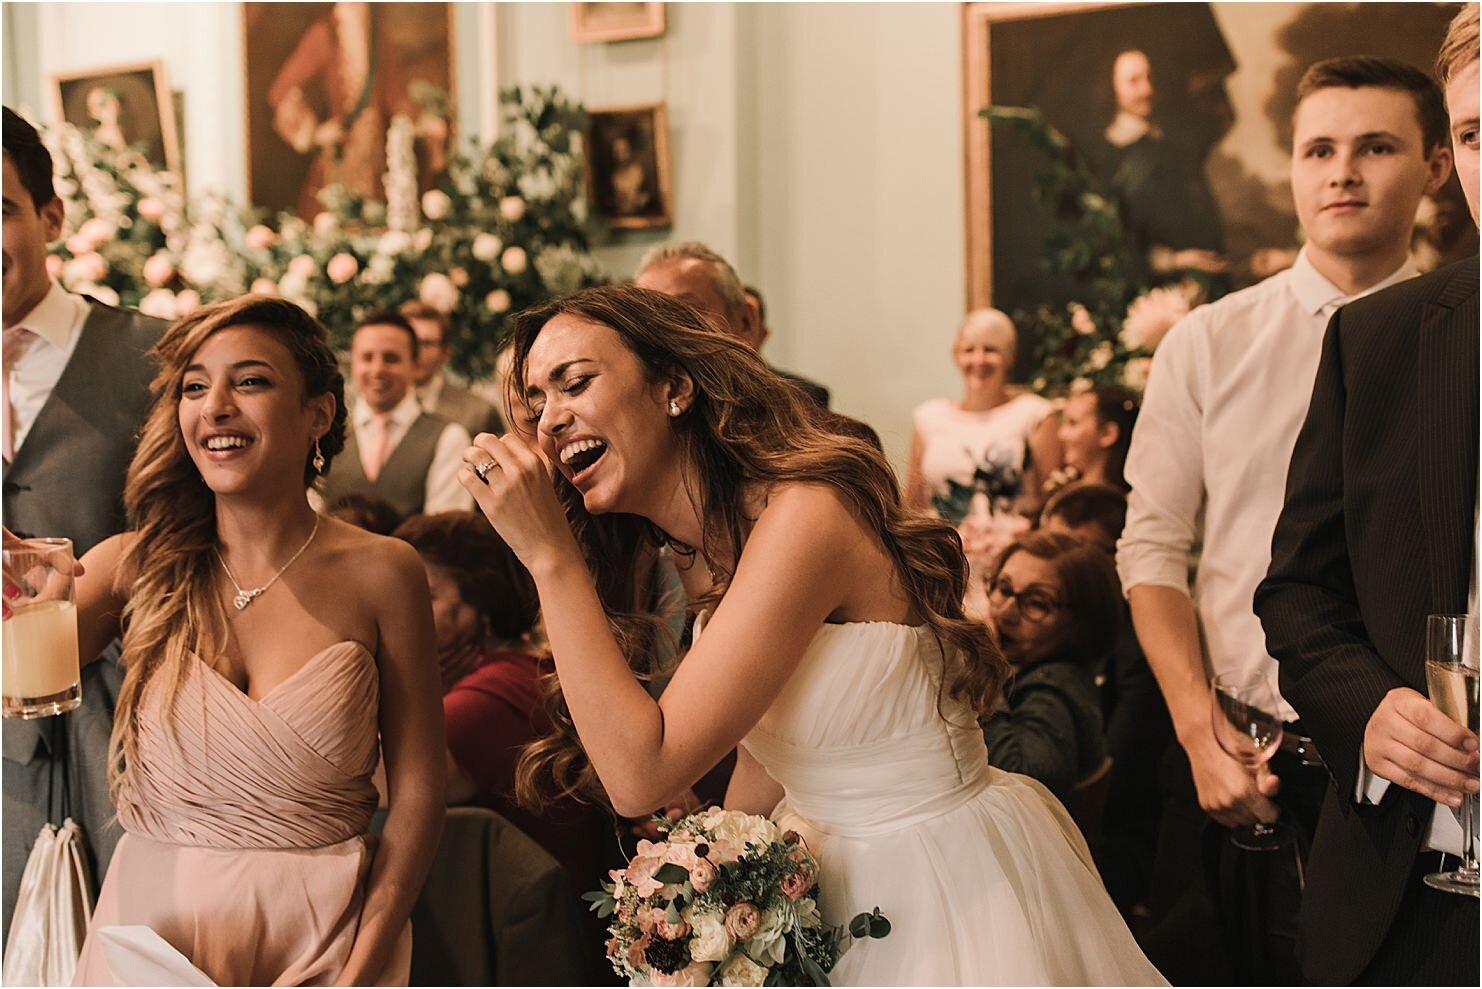 boda-de-cuento-en-castillo-boda-en-londres-83.jpg